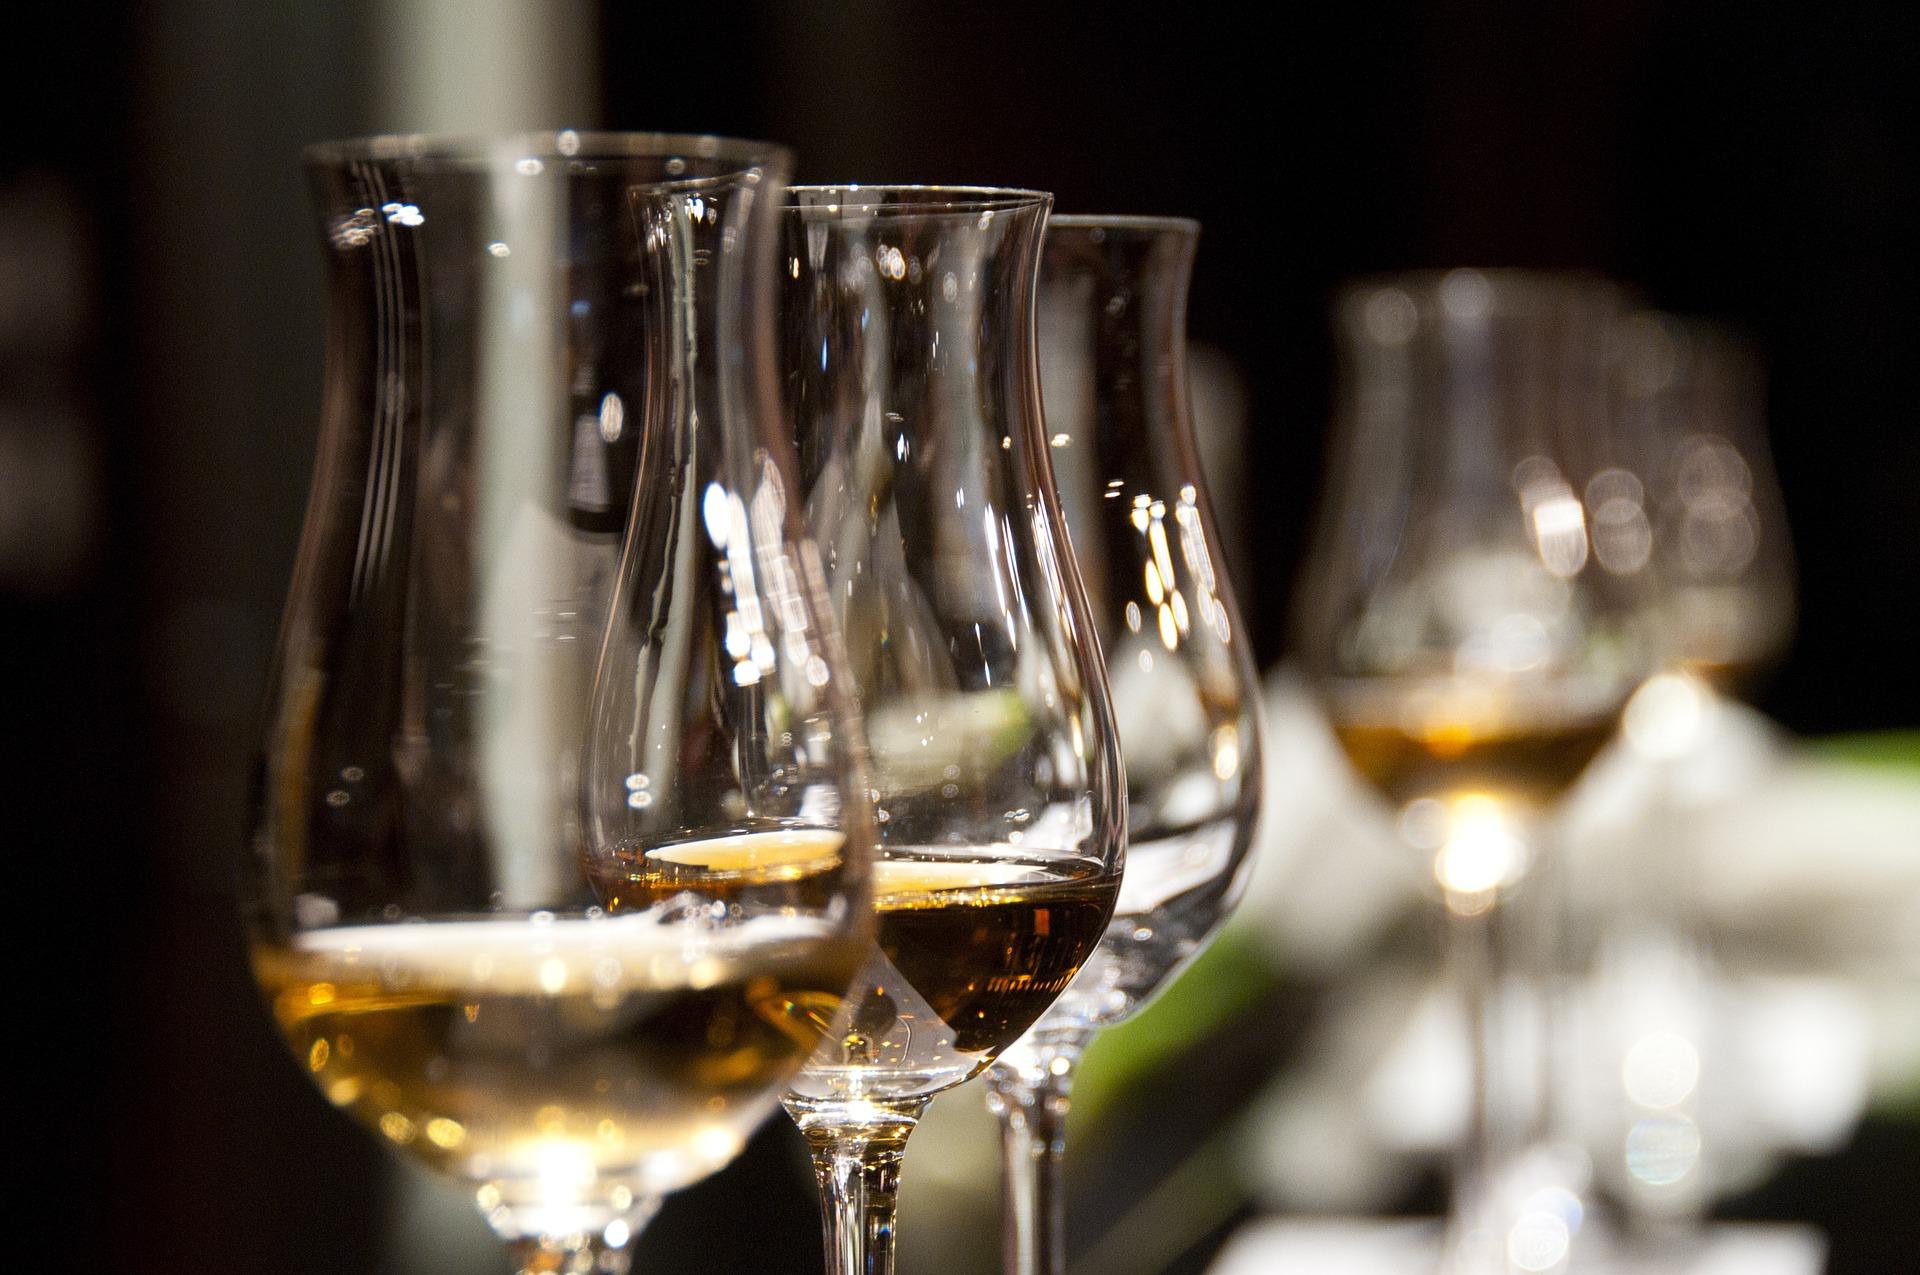 wine-glasses-1246240_1920.jpg